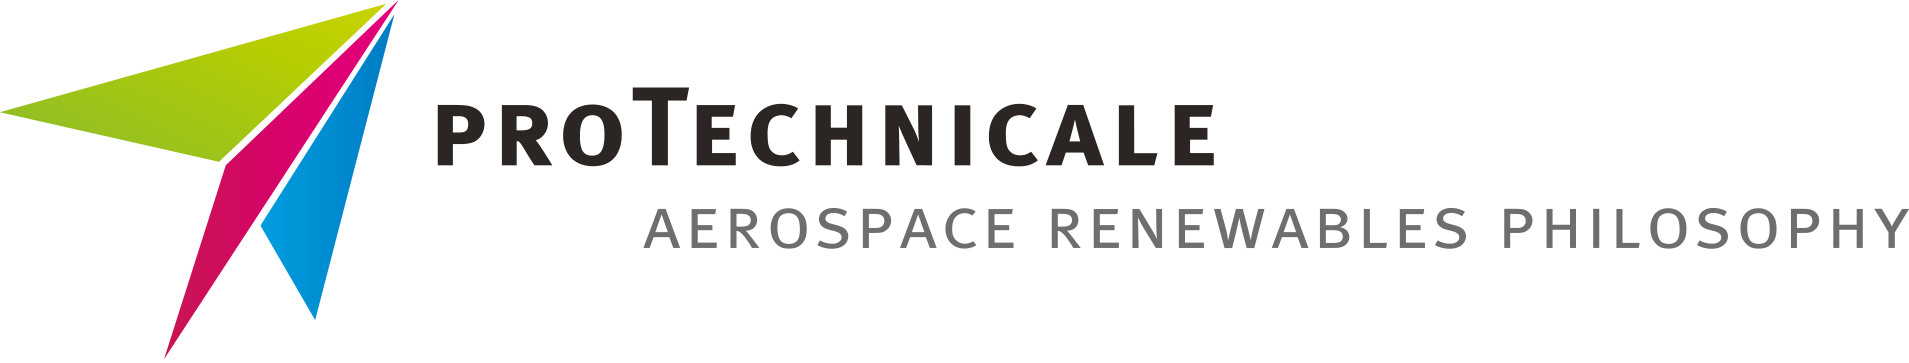 proTechnicale - Sophia.T gemeinnützige GmbH